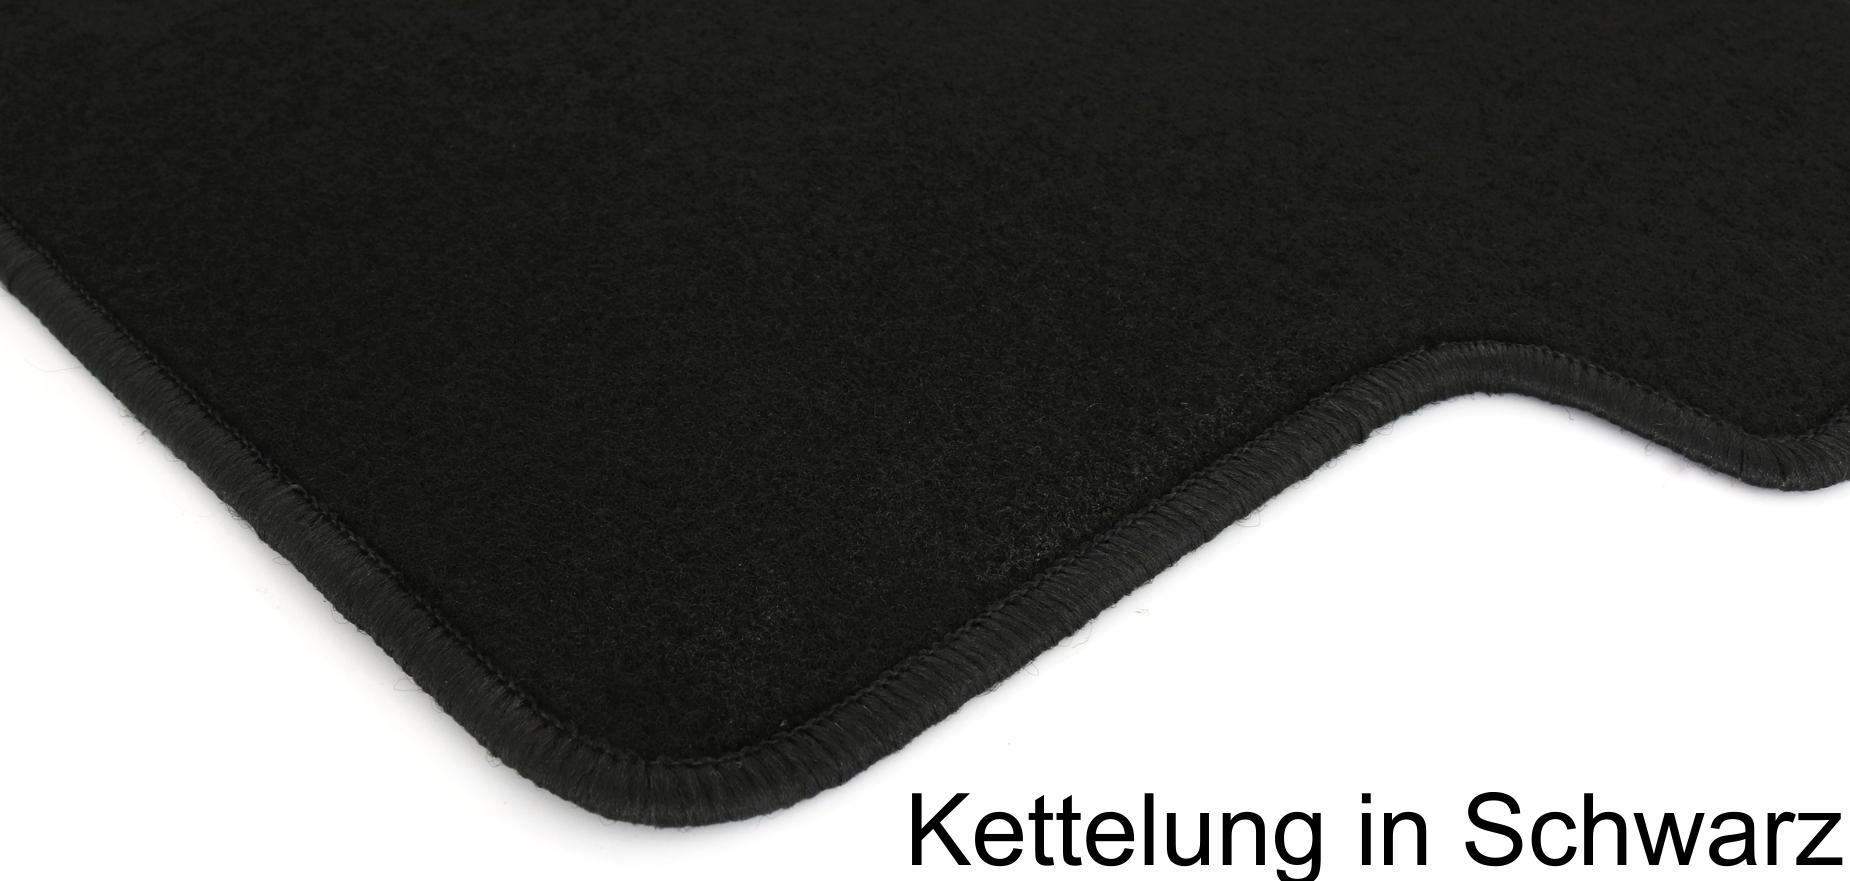 Fußmatten Set für BMW E90 E91 3er Limo Touring Matten Autoteppiche Passform